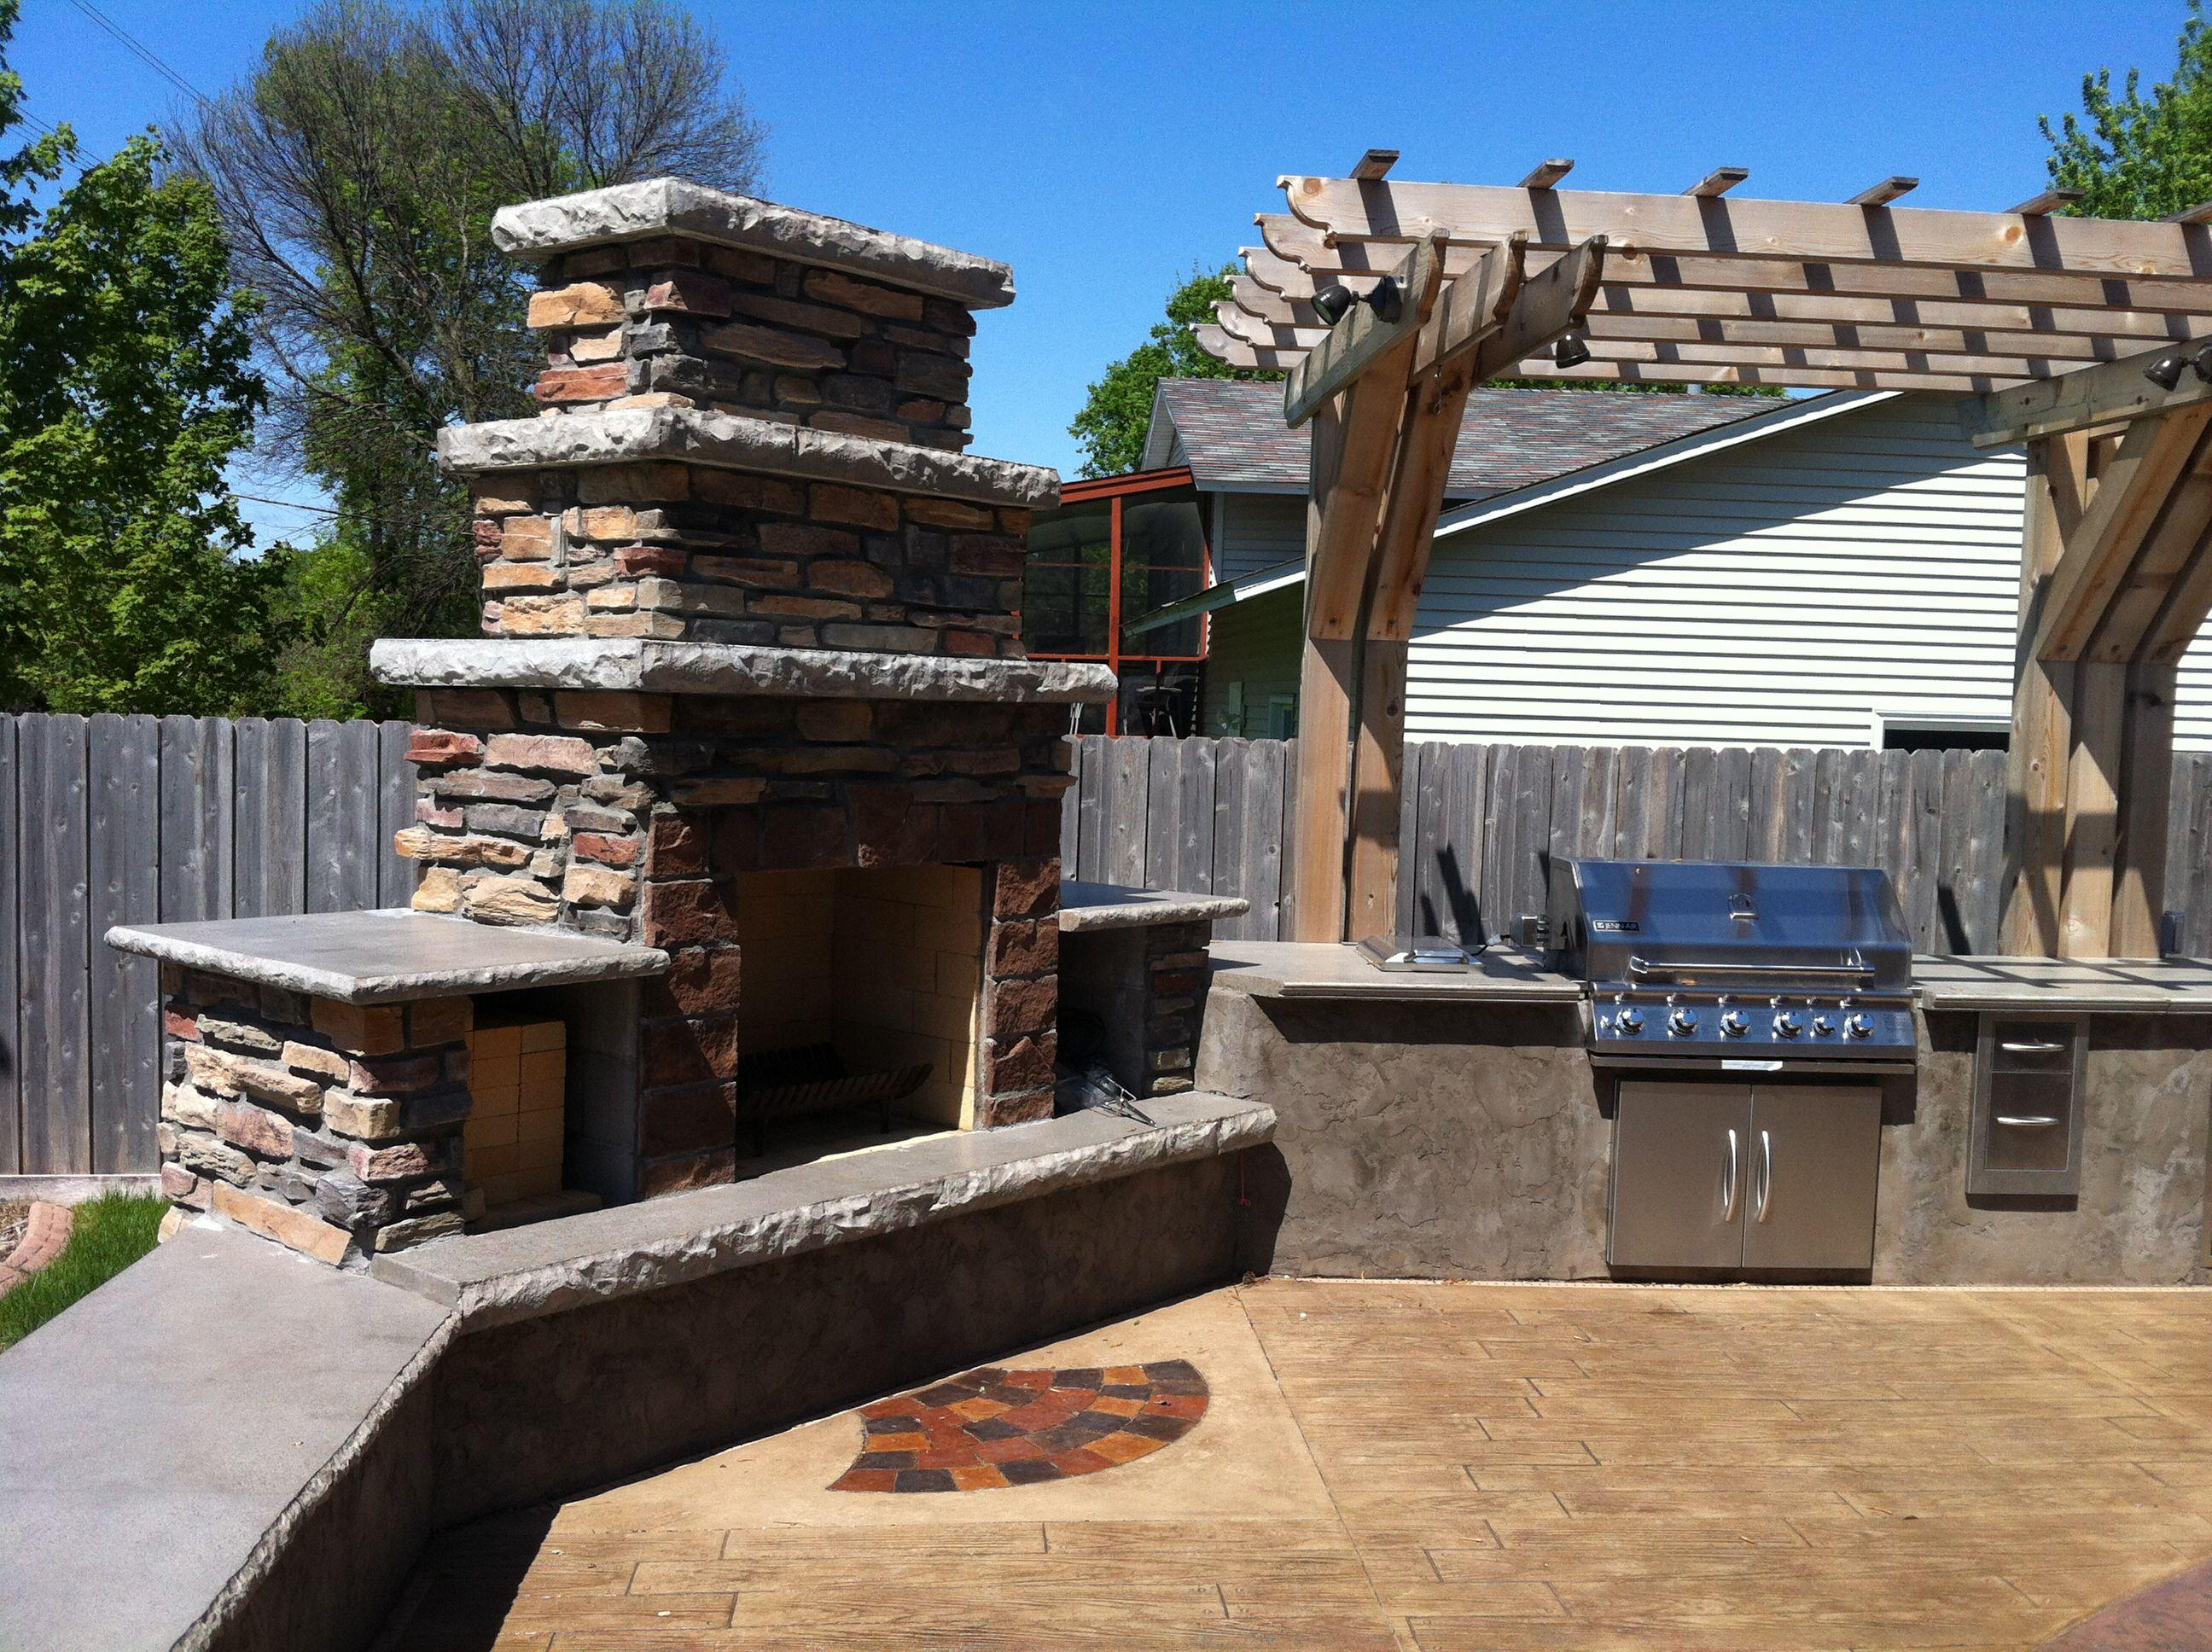 Astonishing Corner Unit Outdoor Fireplace And Kitchen Outdoor Download Free Architecture Designs Rallybritishbridgeorg